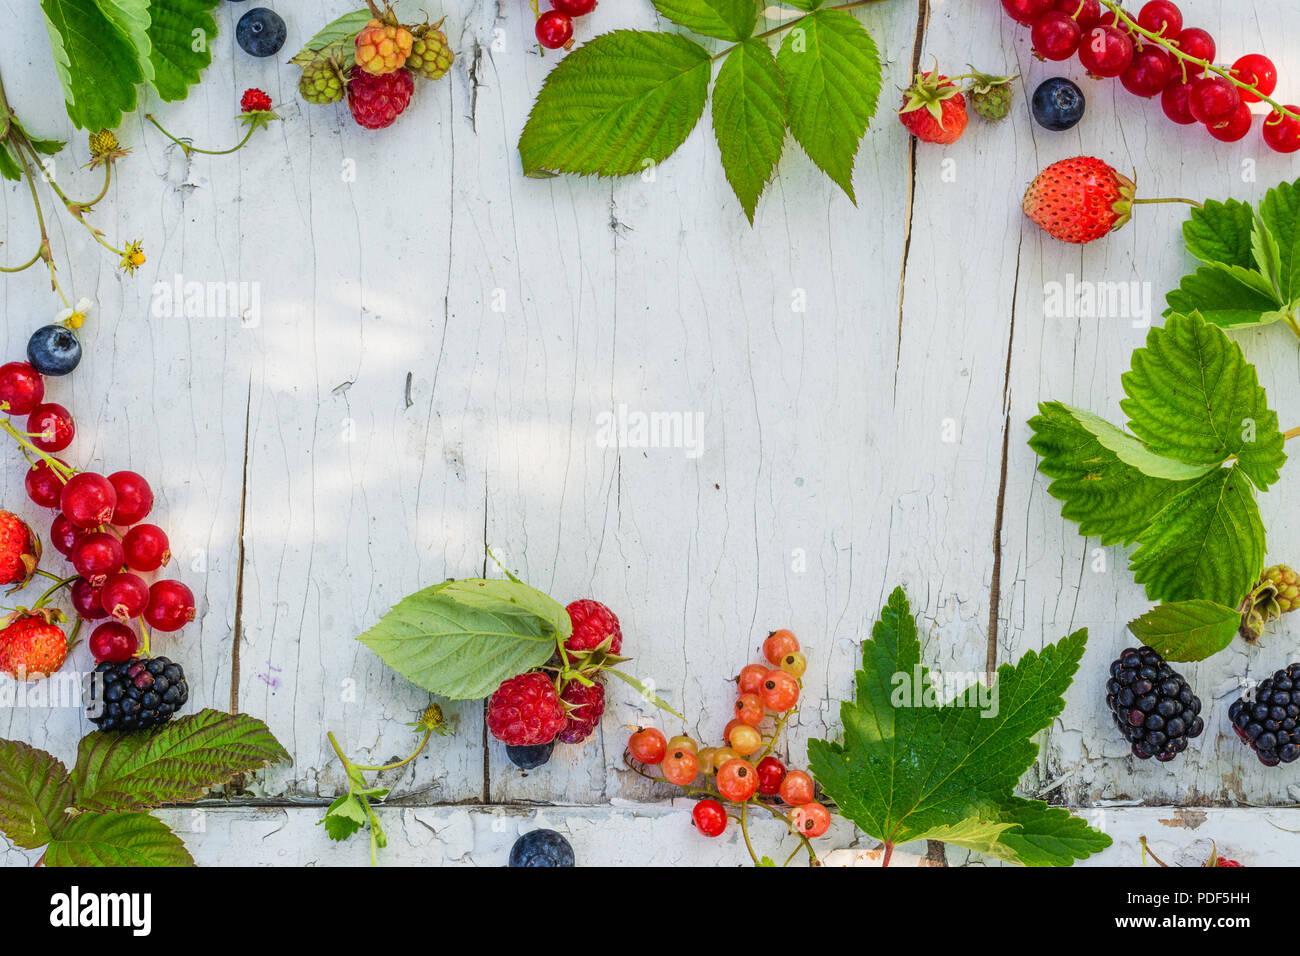 Assortment of summer garden berries on vintage background - Stock Image